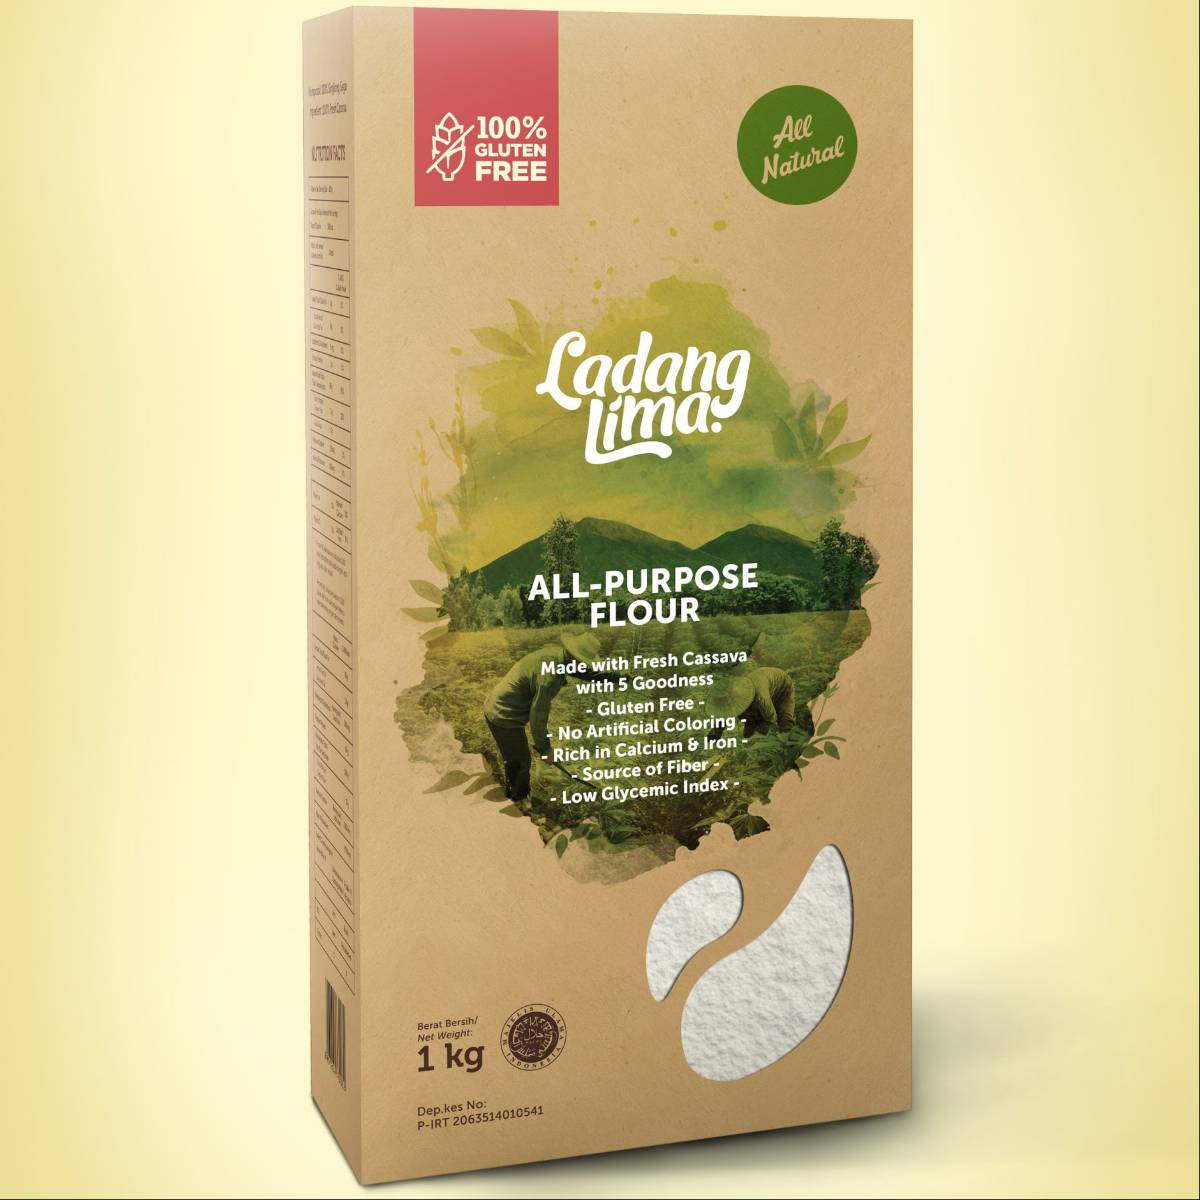 Ladang Lima Cassava Flour2